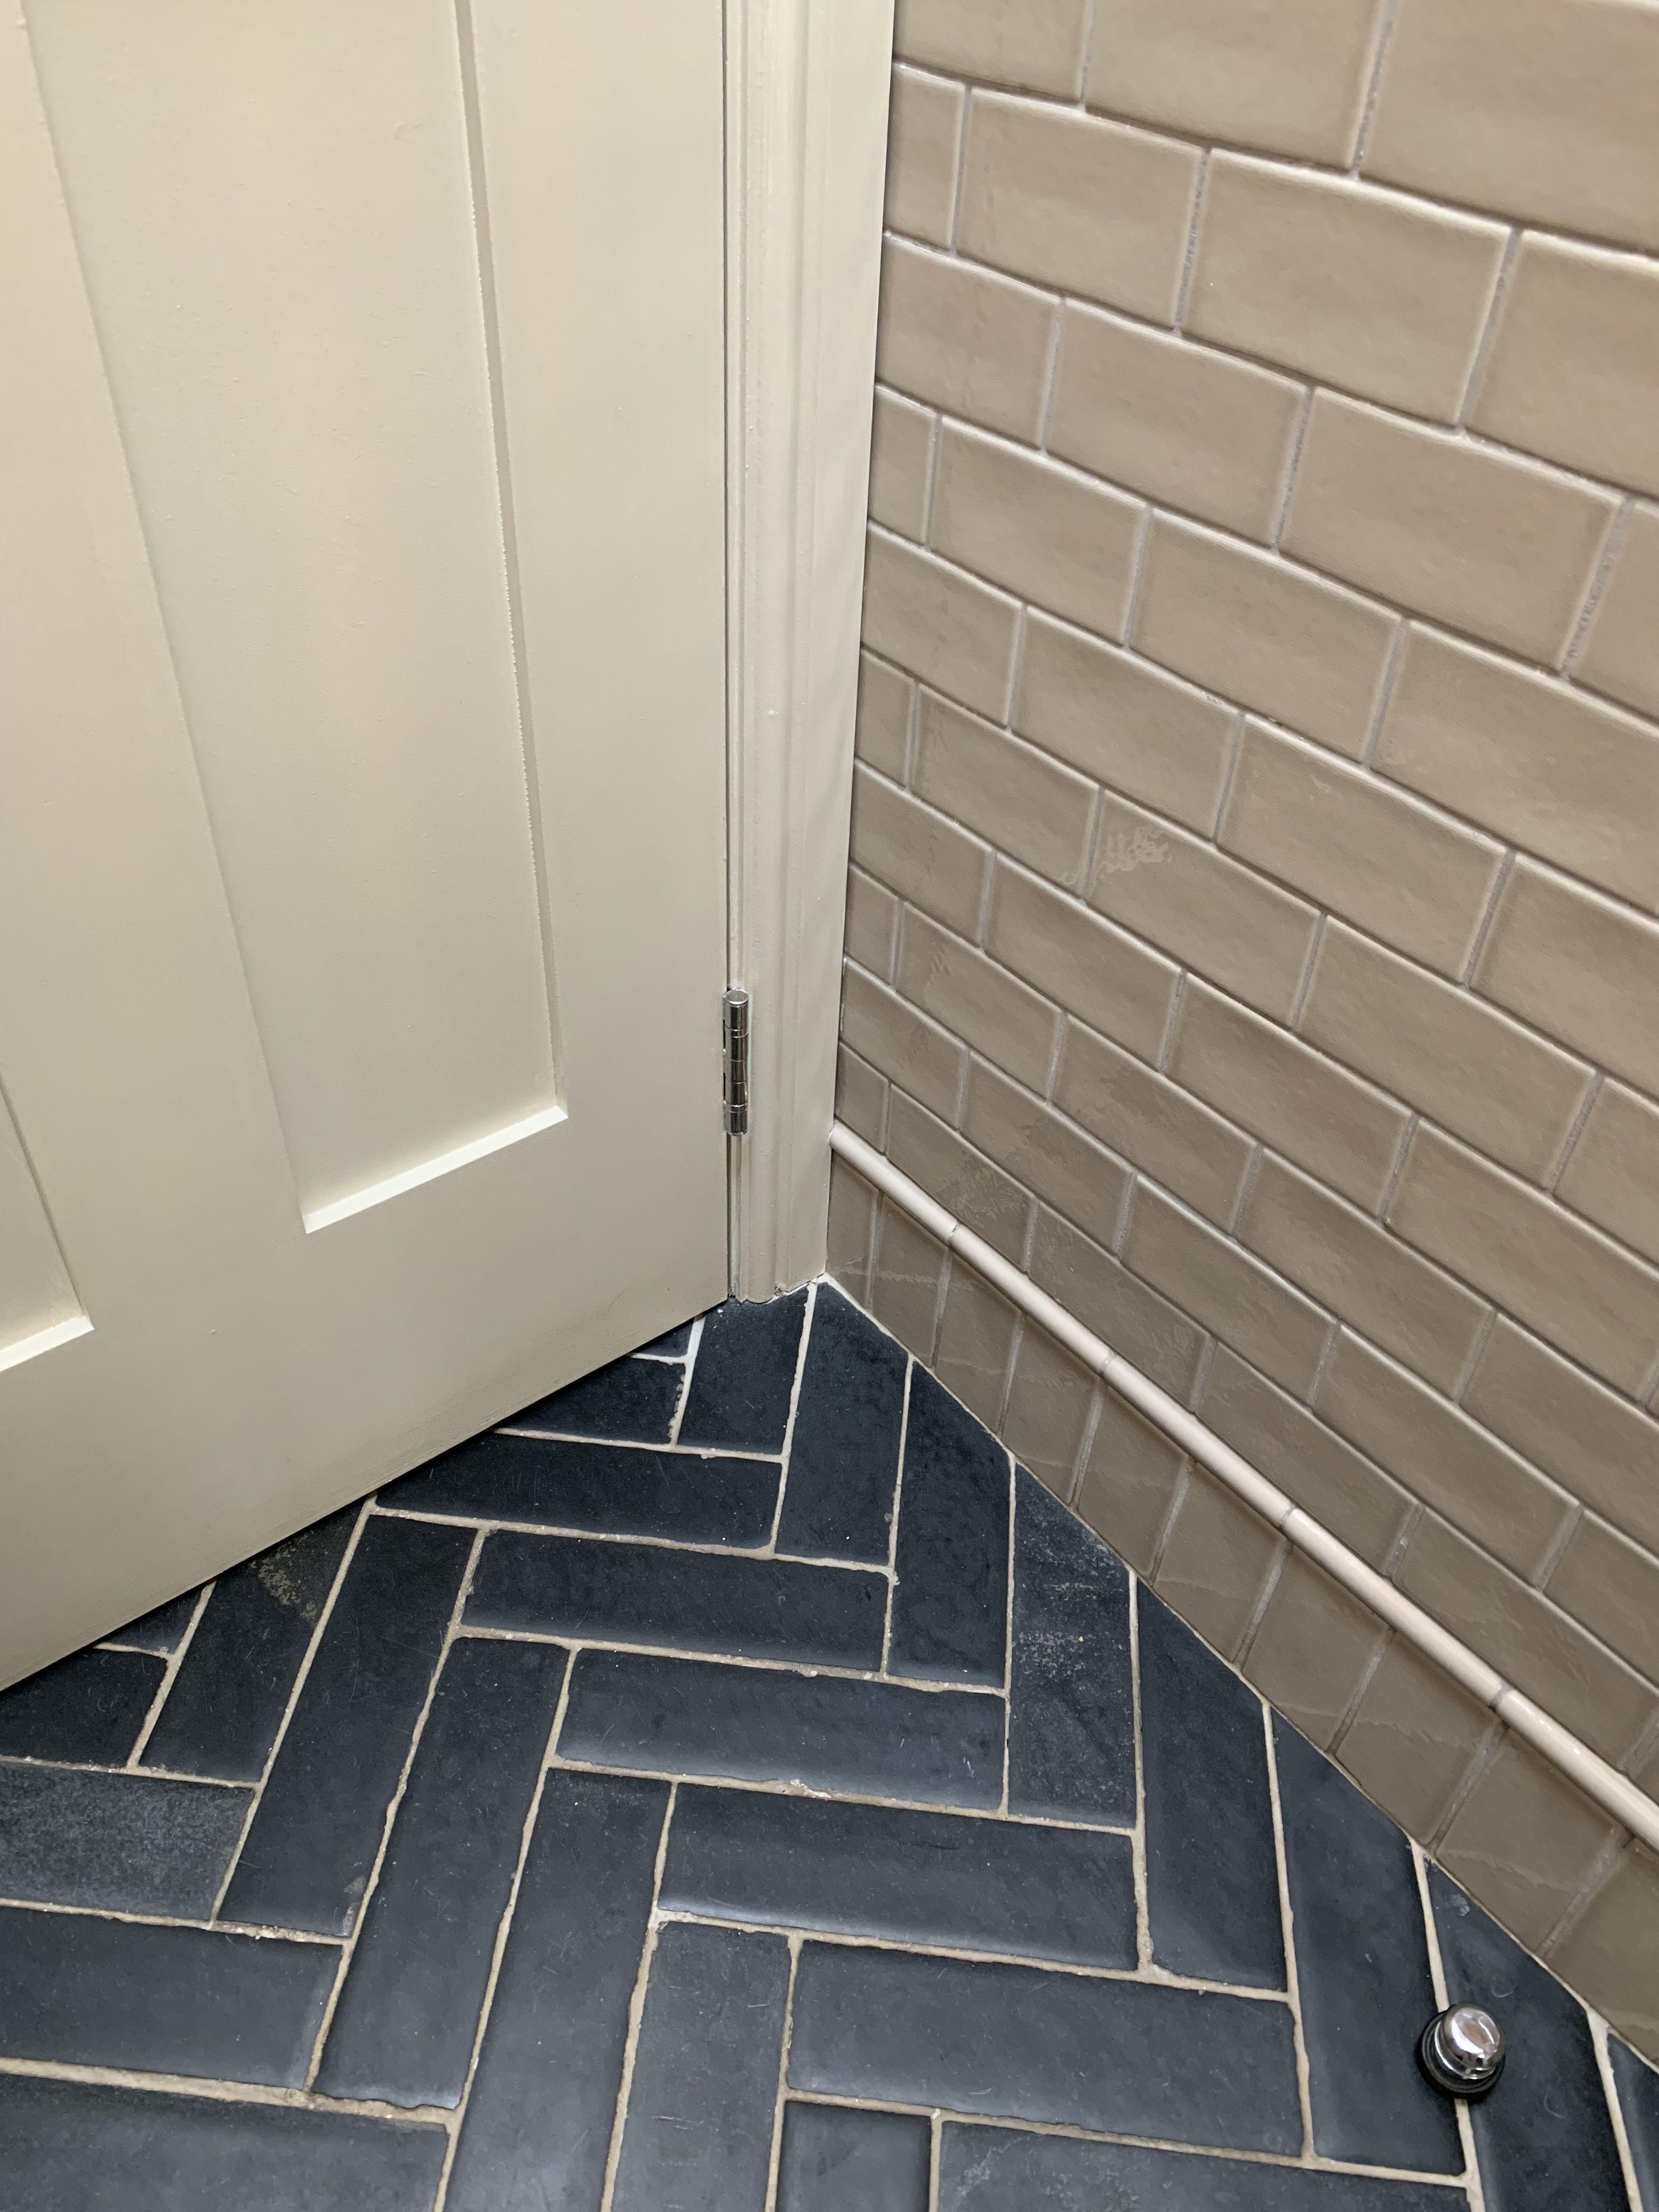 Pin By Sarah Saleh On Walls Flooring Tiles Tile Floor